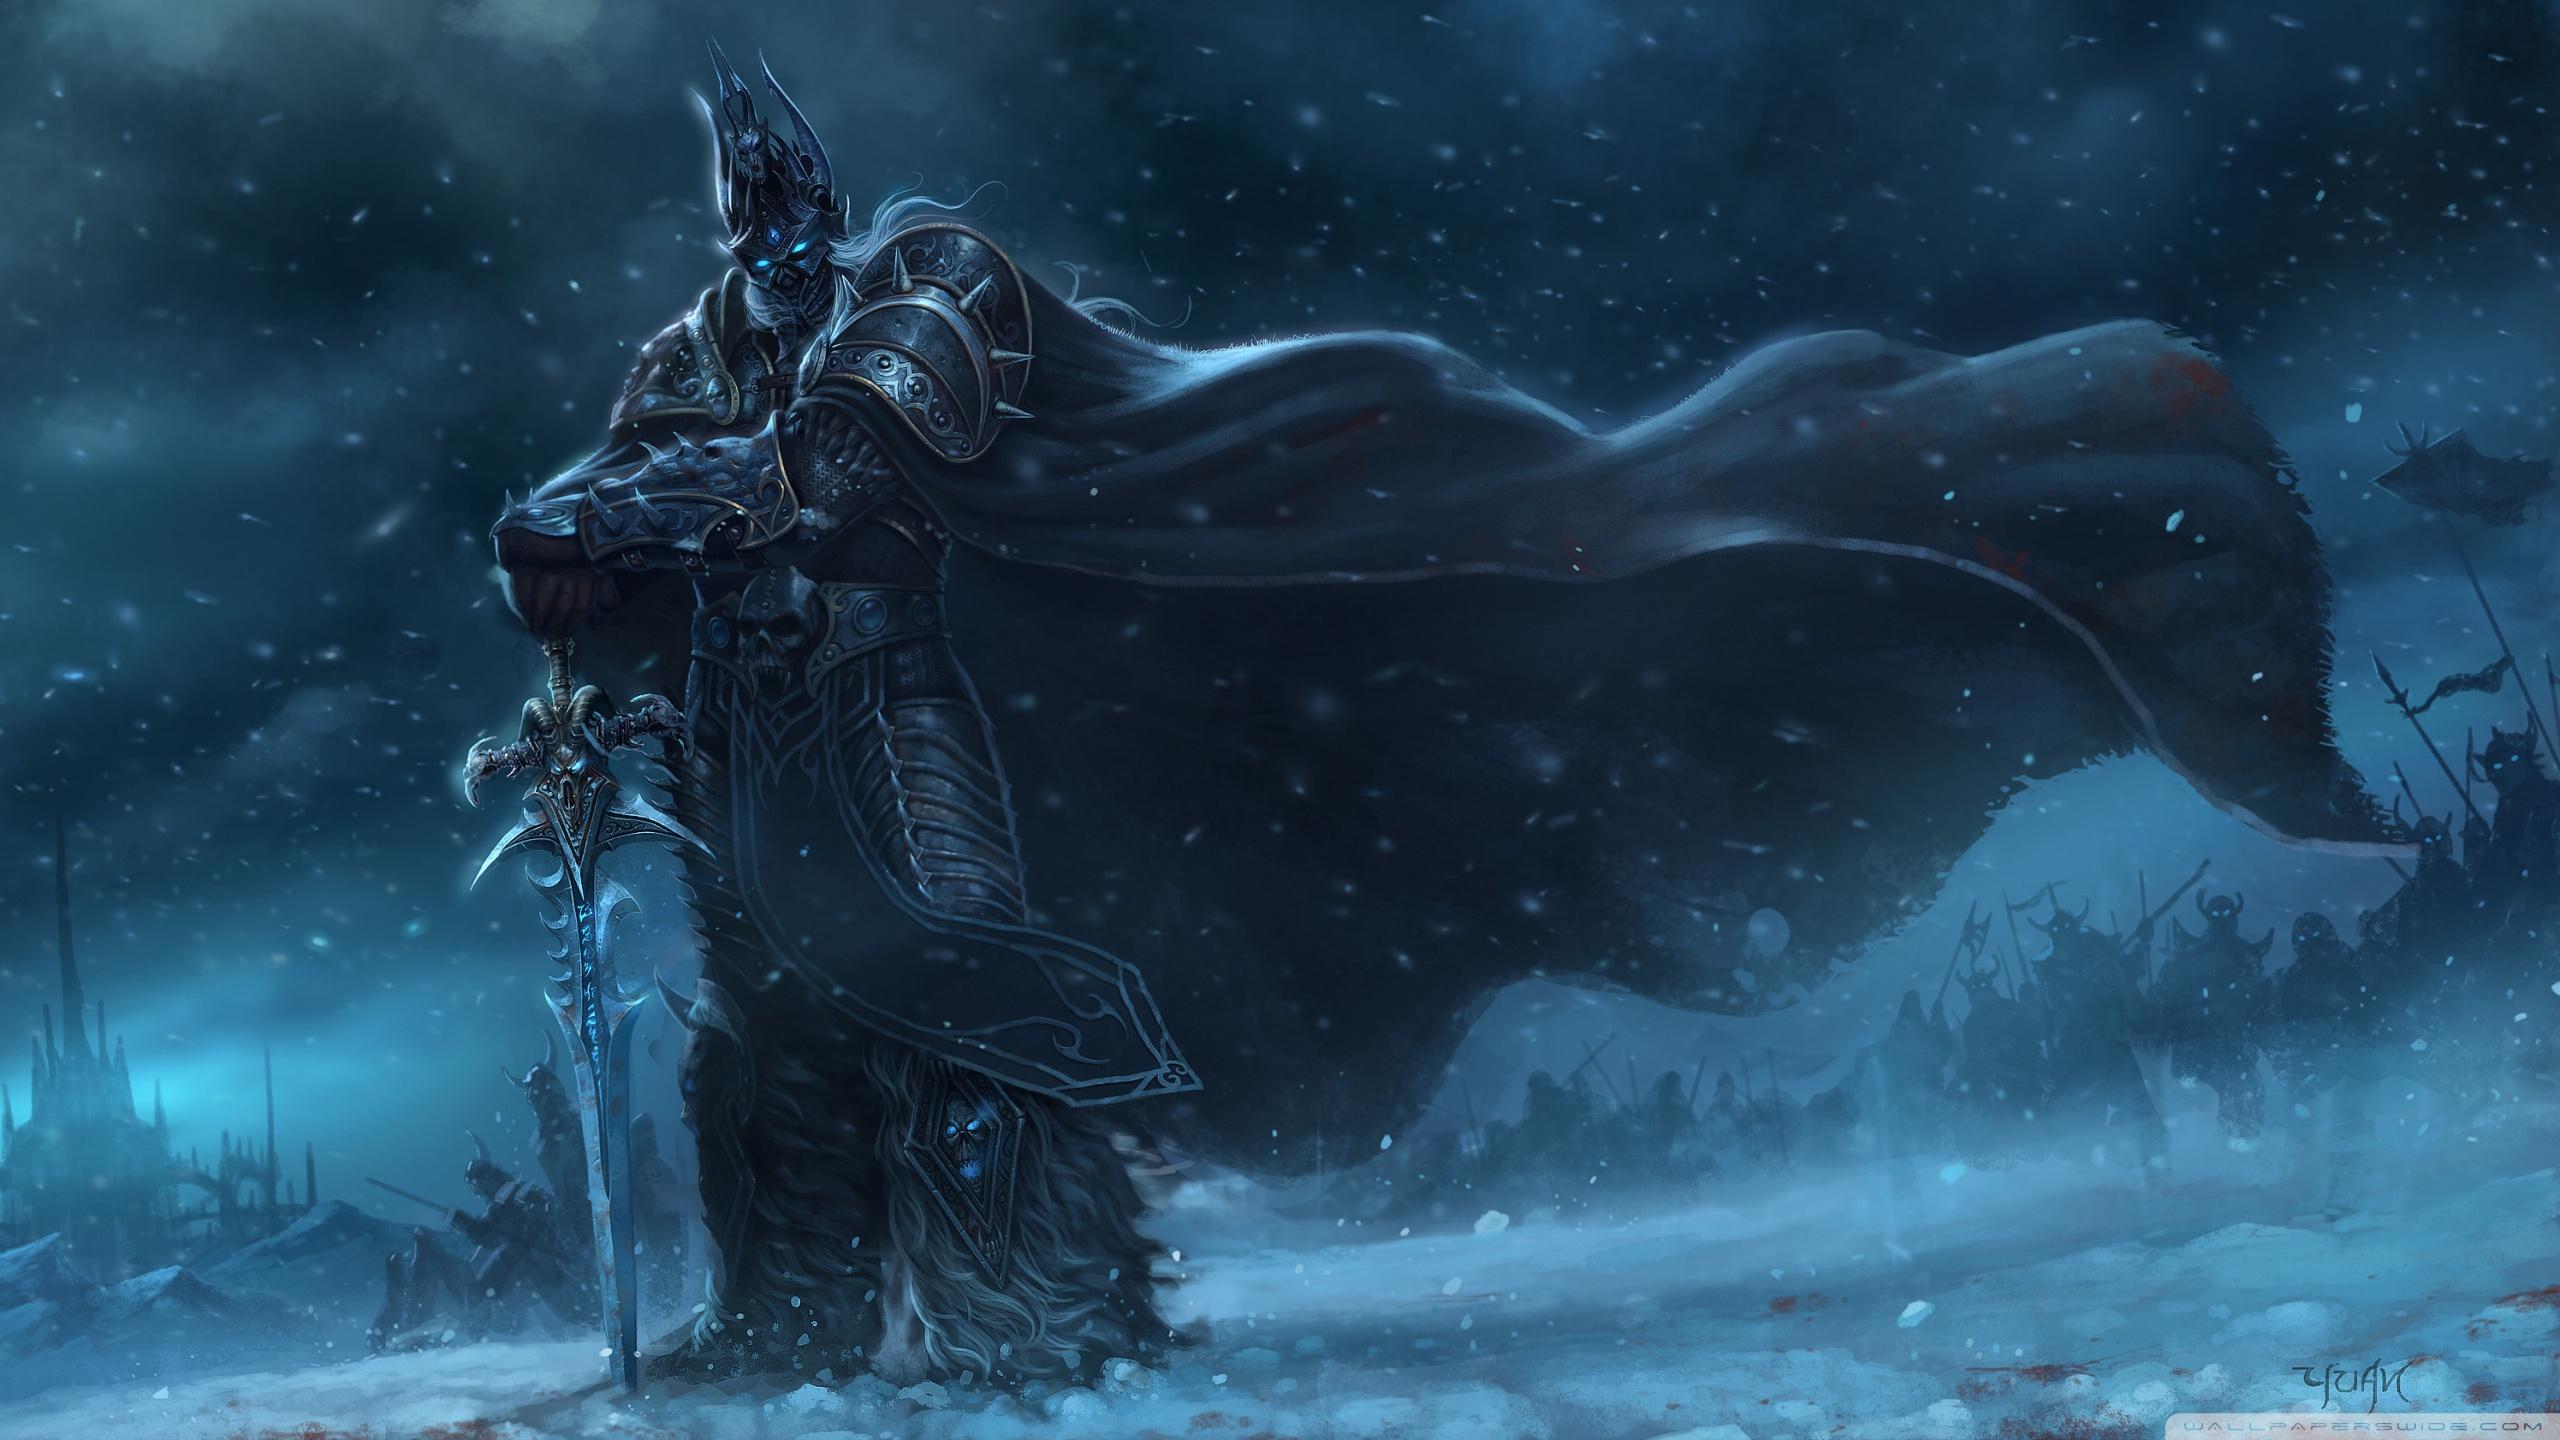 Index Of World Of Warcraftwow Hd Wallpaper Pack 1 Frozen Throneir